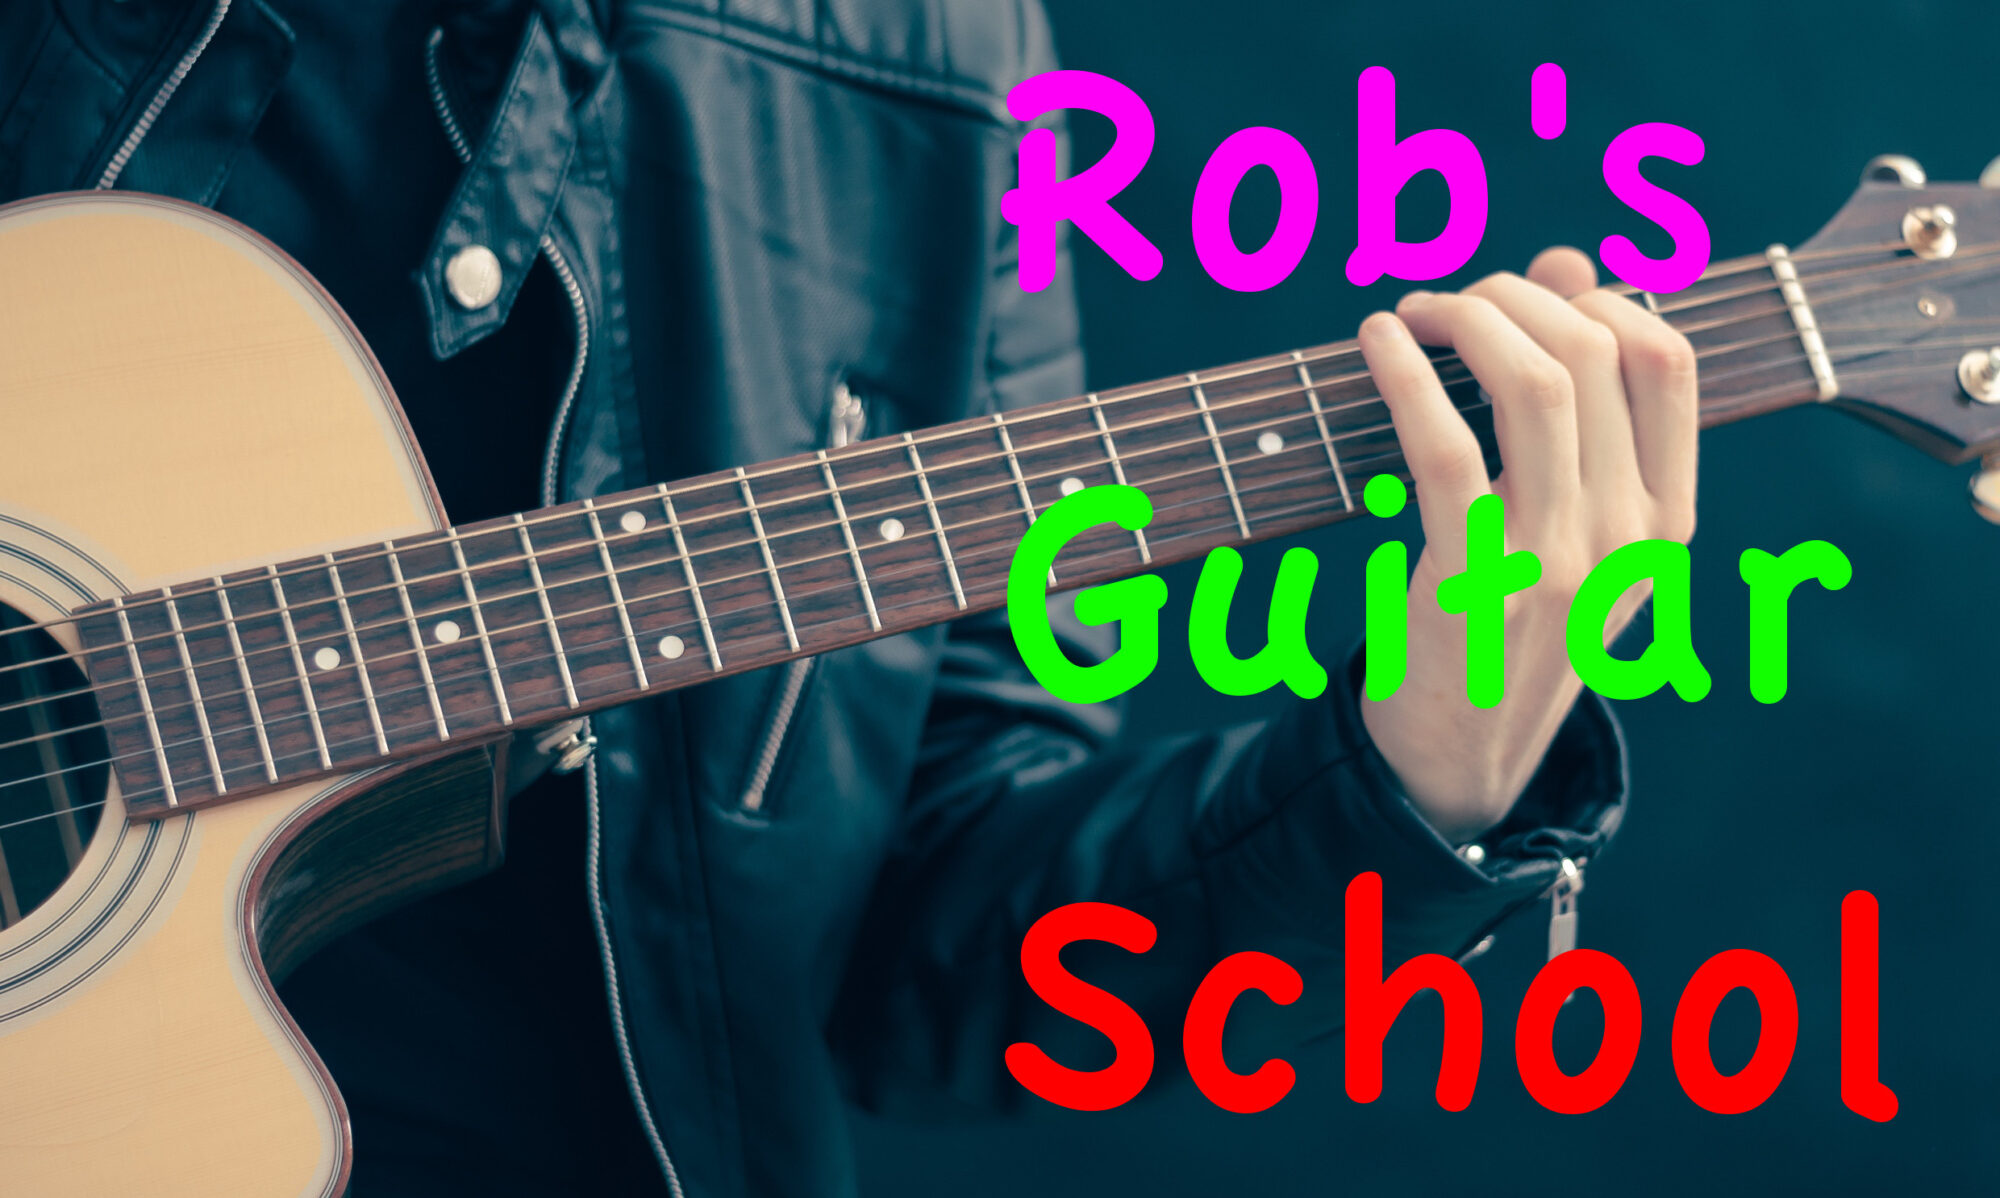 Rob's Guitar School